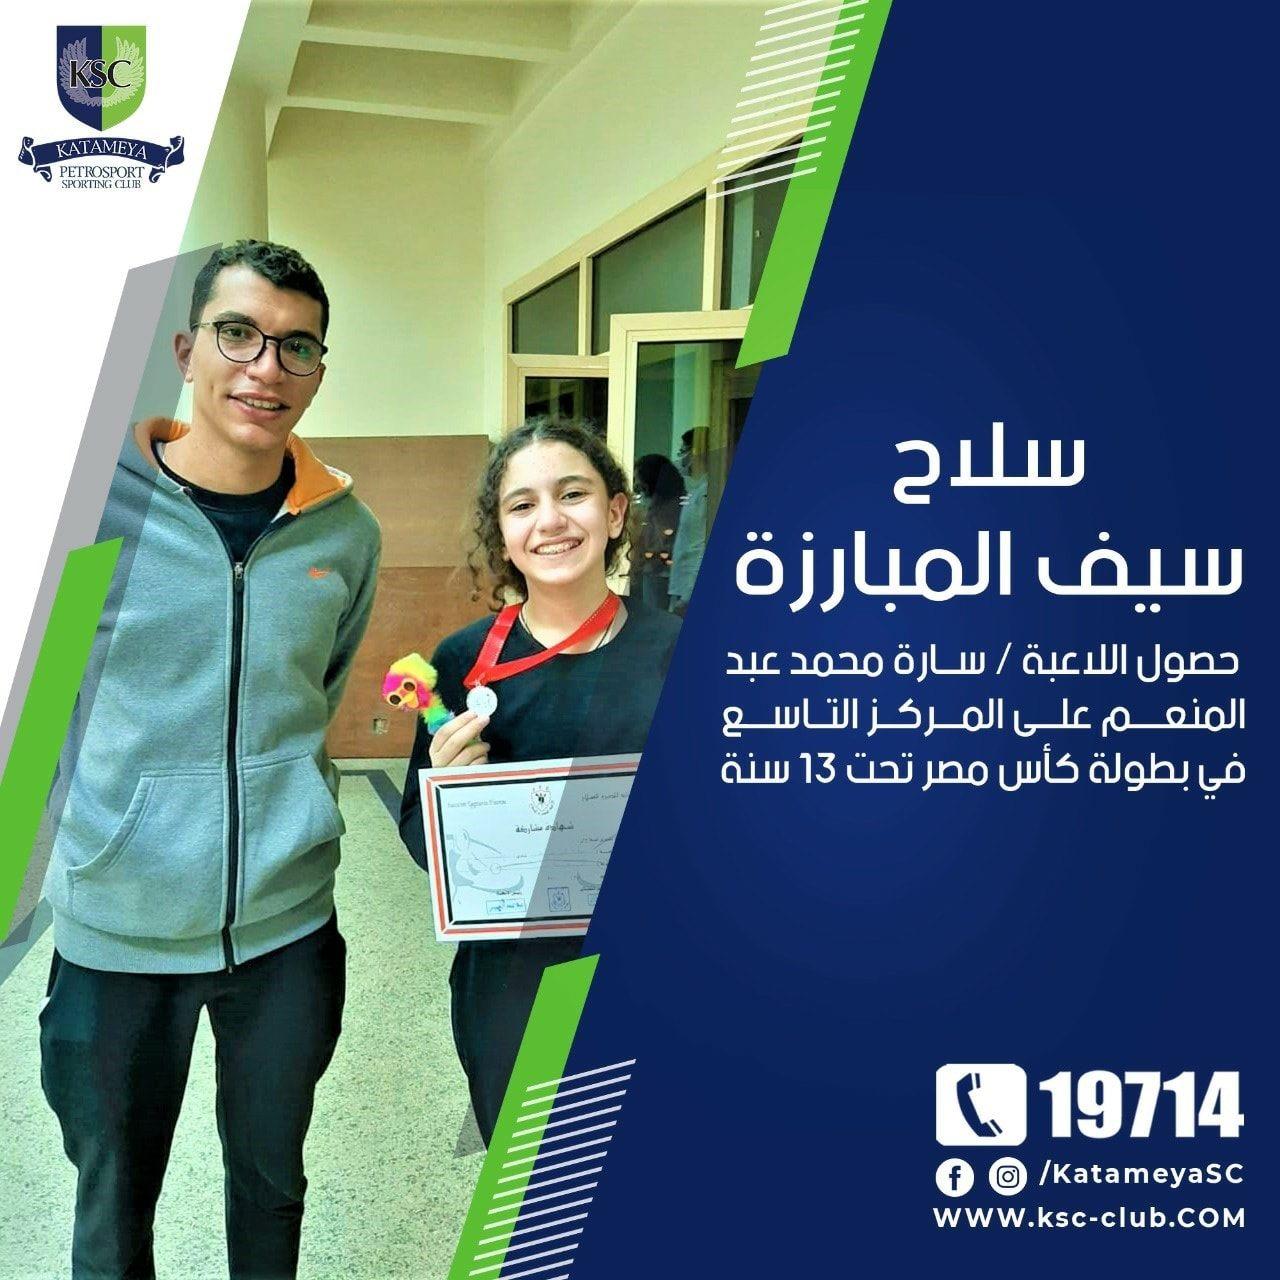 You are currently viewing حصول اللاعبة سارة علي المركز التاسع